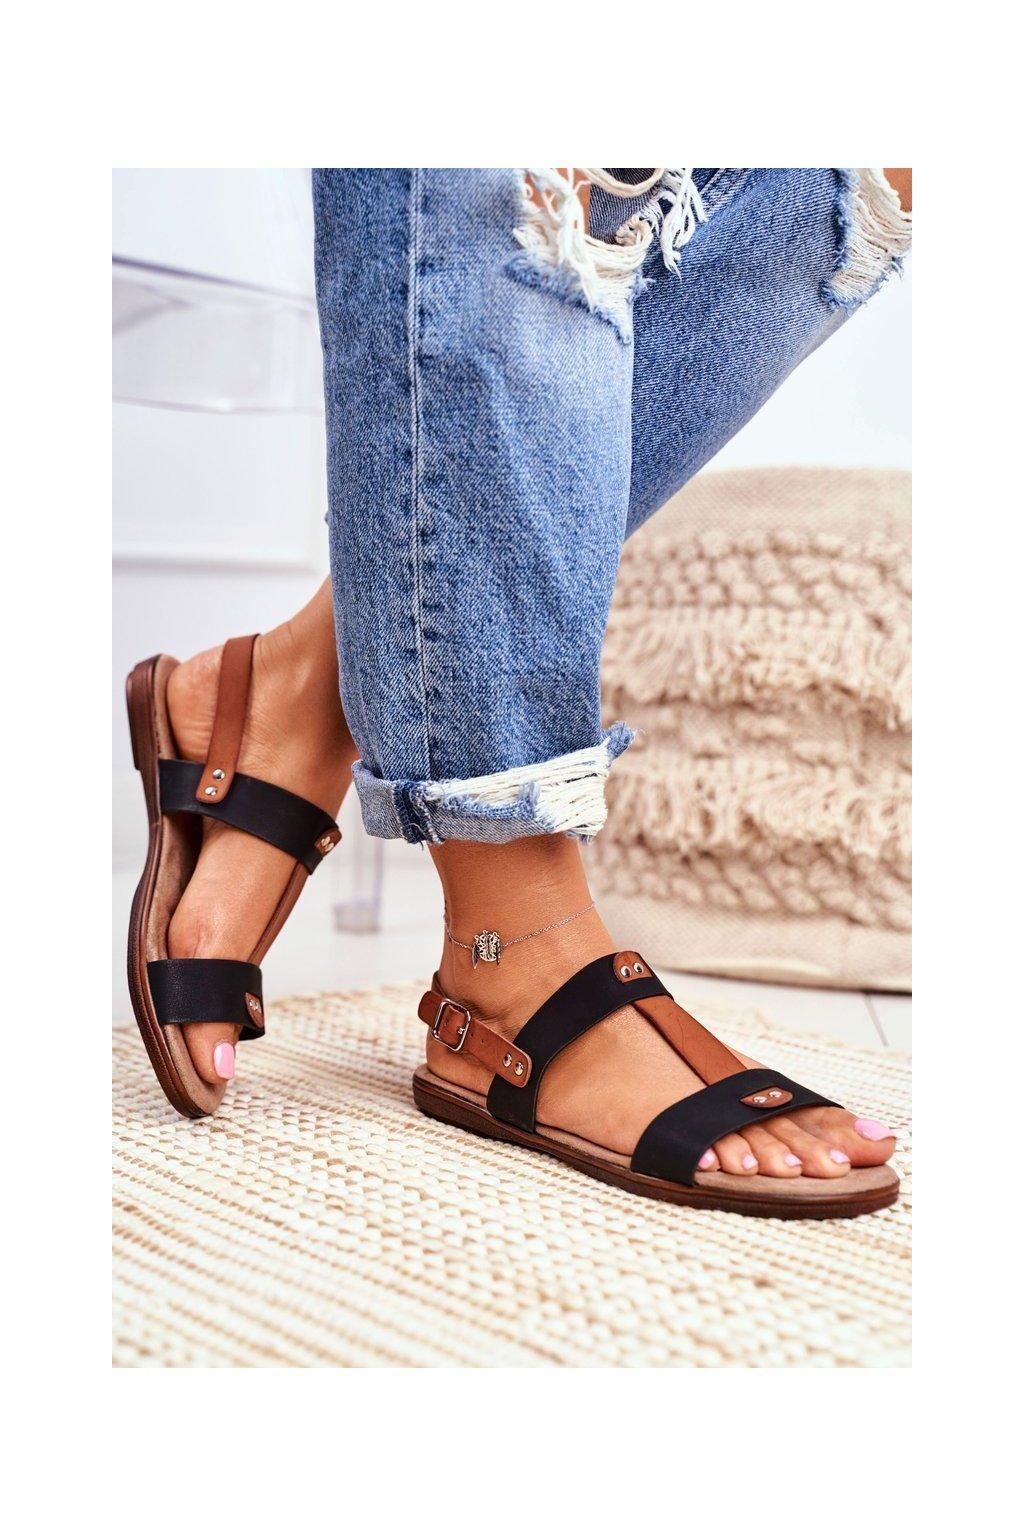 Dámske sandále s plochou podrážkou farba čierna kód obuvi 20SD35-0307 BLK